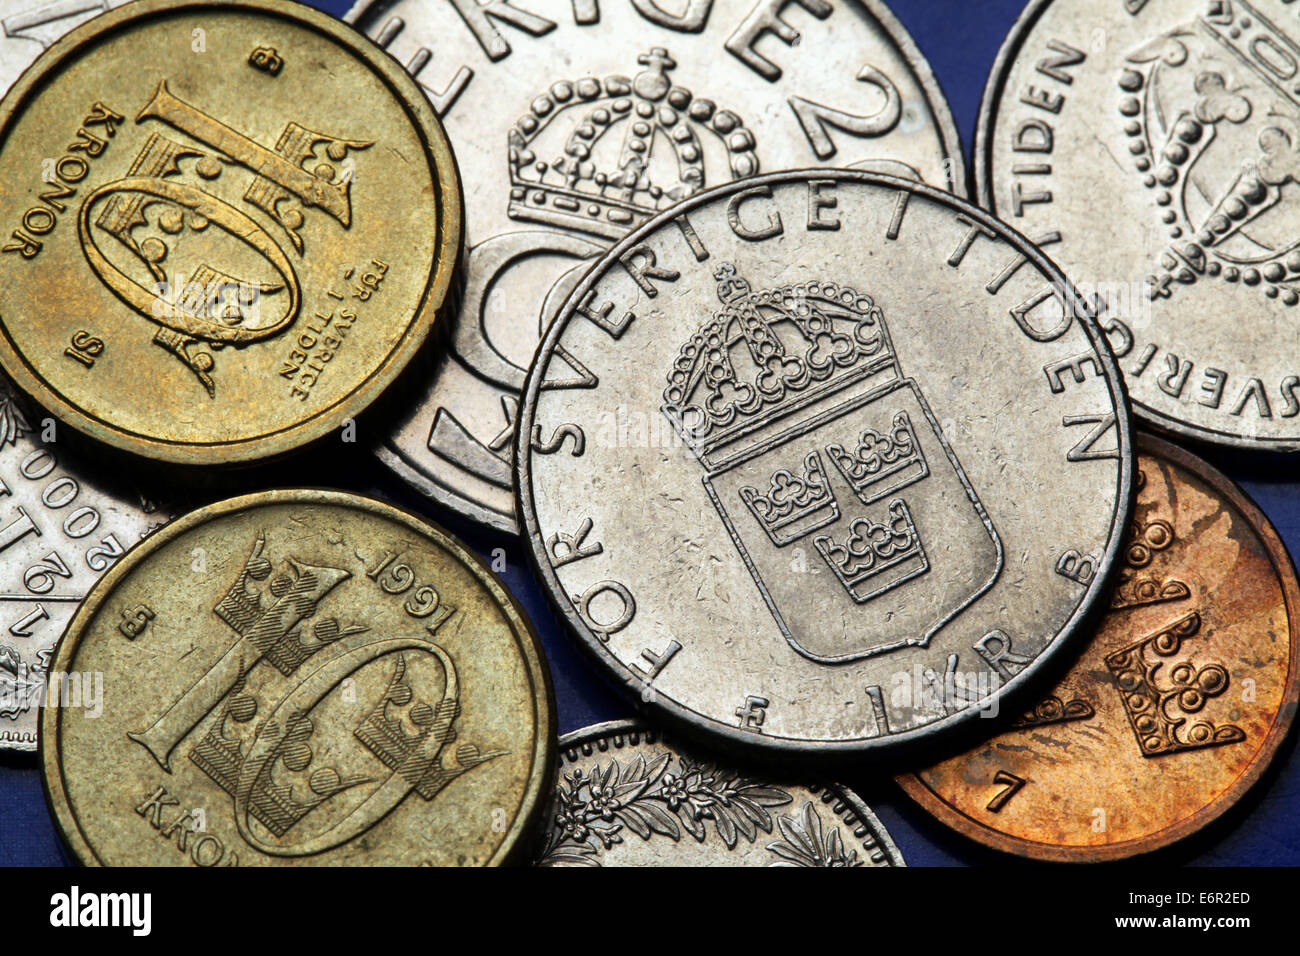 Swedish Coin Photos Swedish Coin Images Alamy